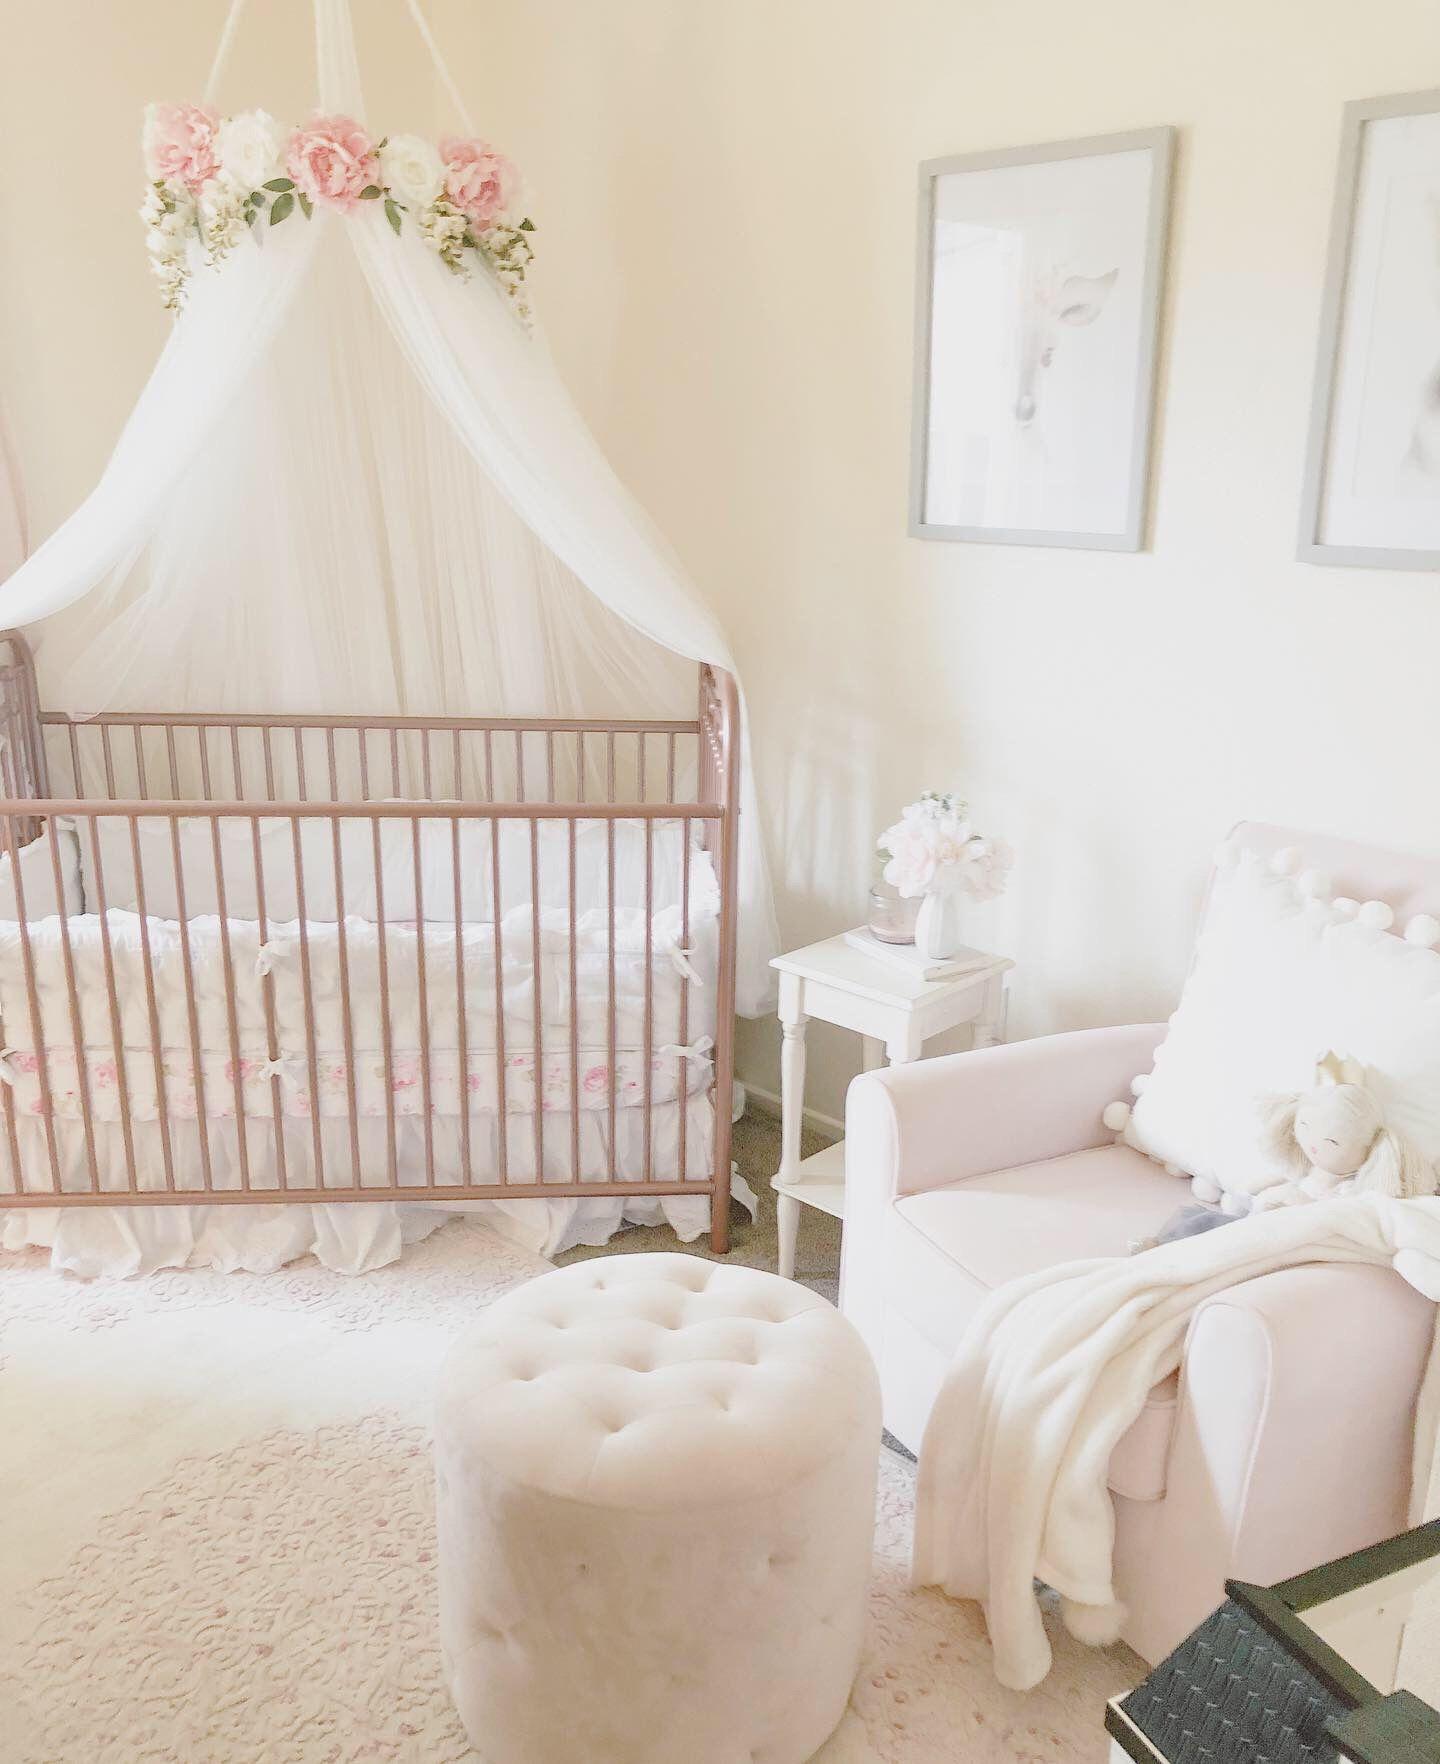 New Baby Boy Girl Nursery Personalised  Wooden Bedroom Crown Babyshower Gift